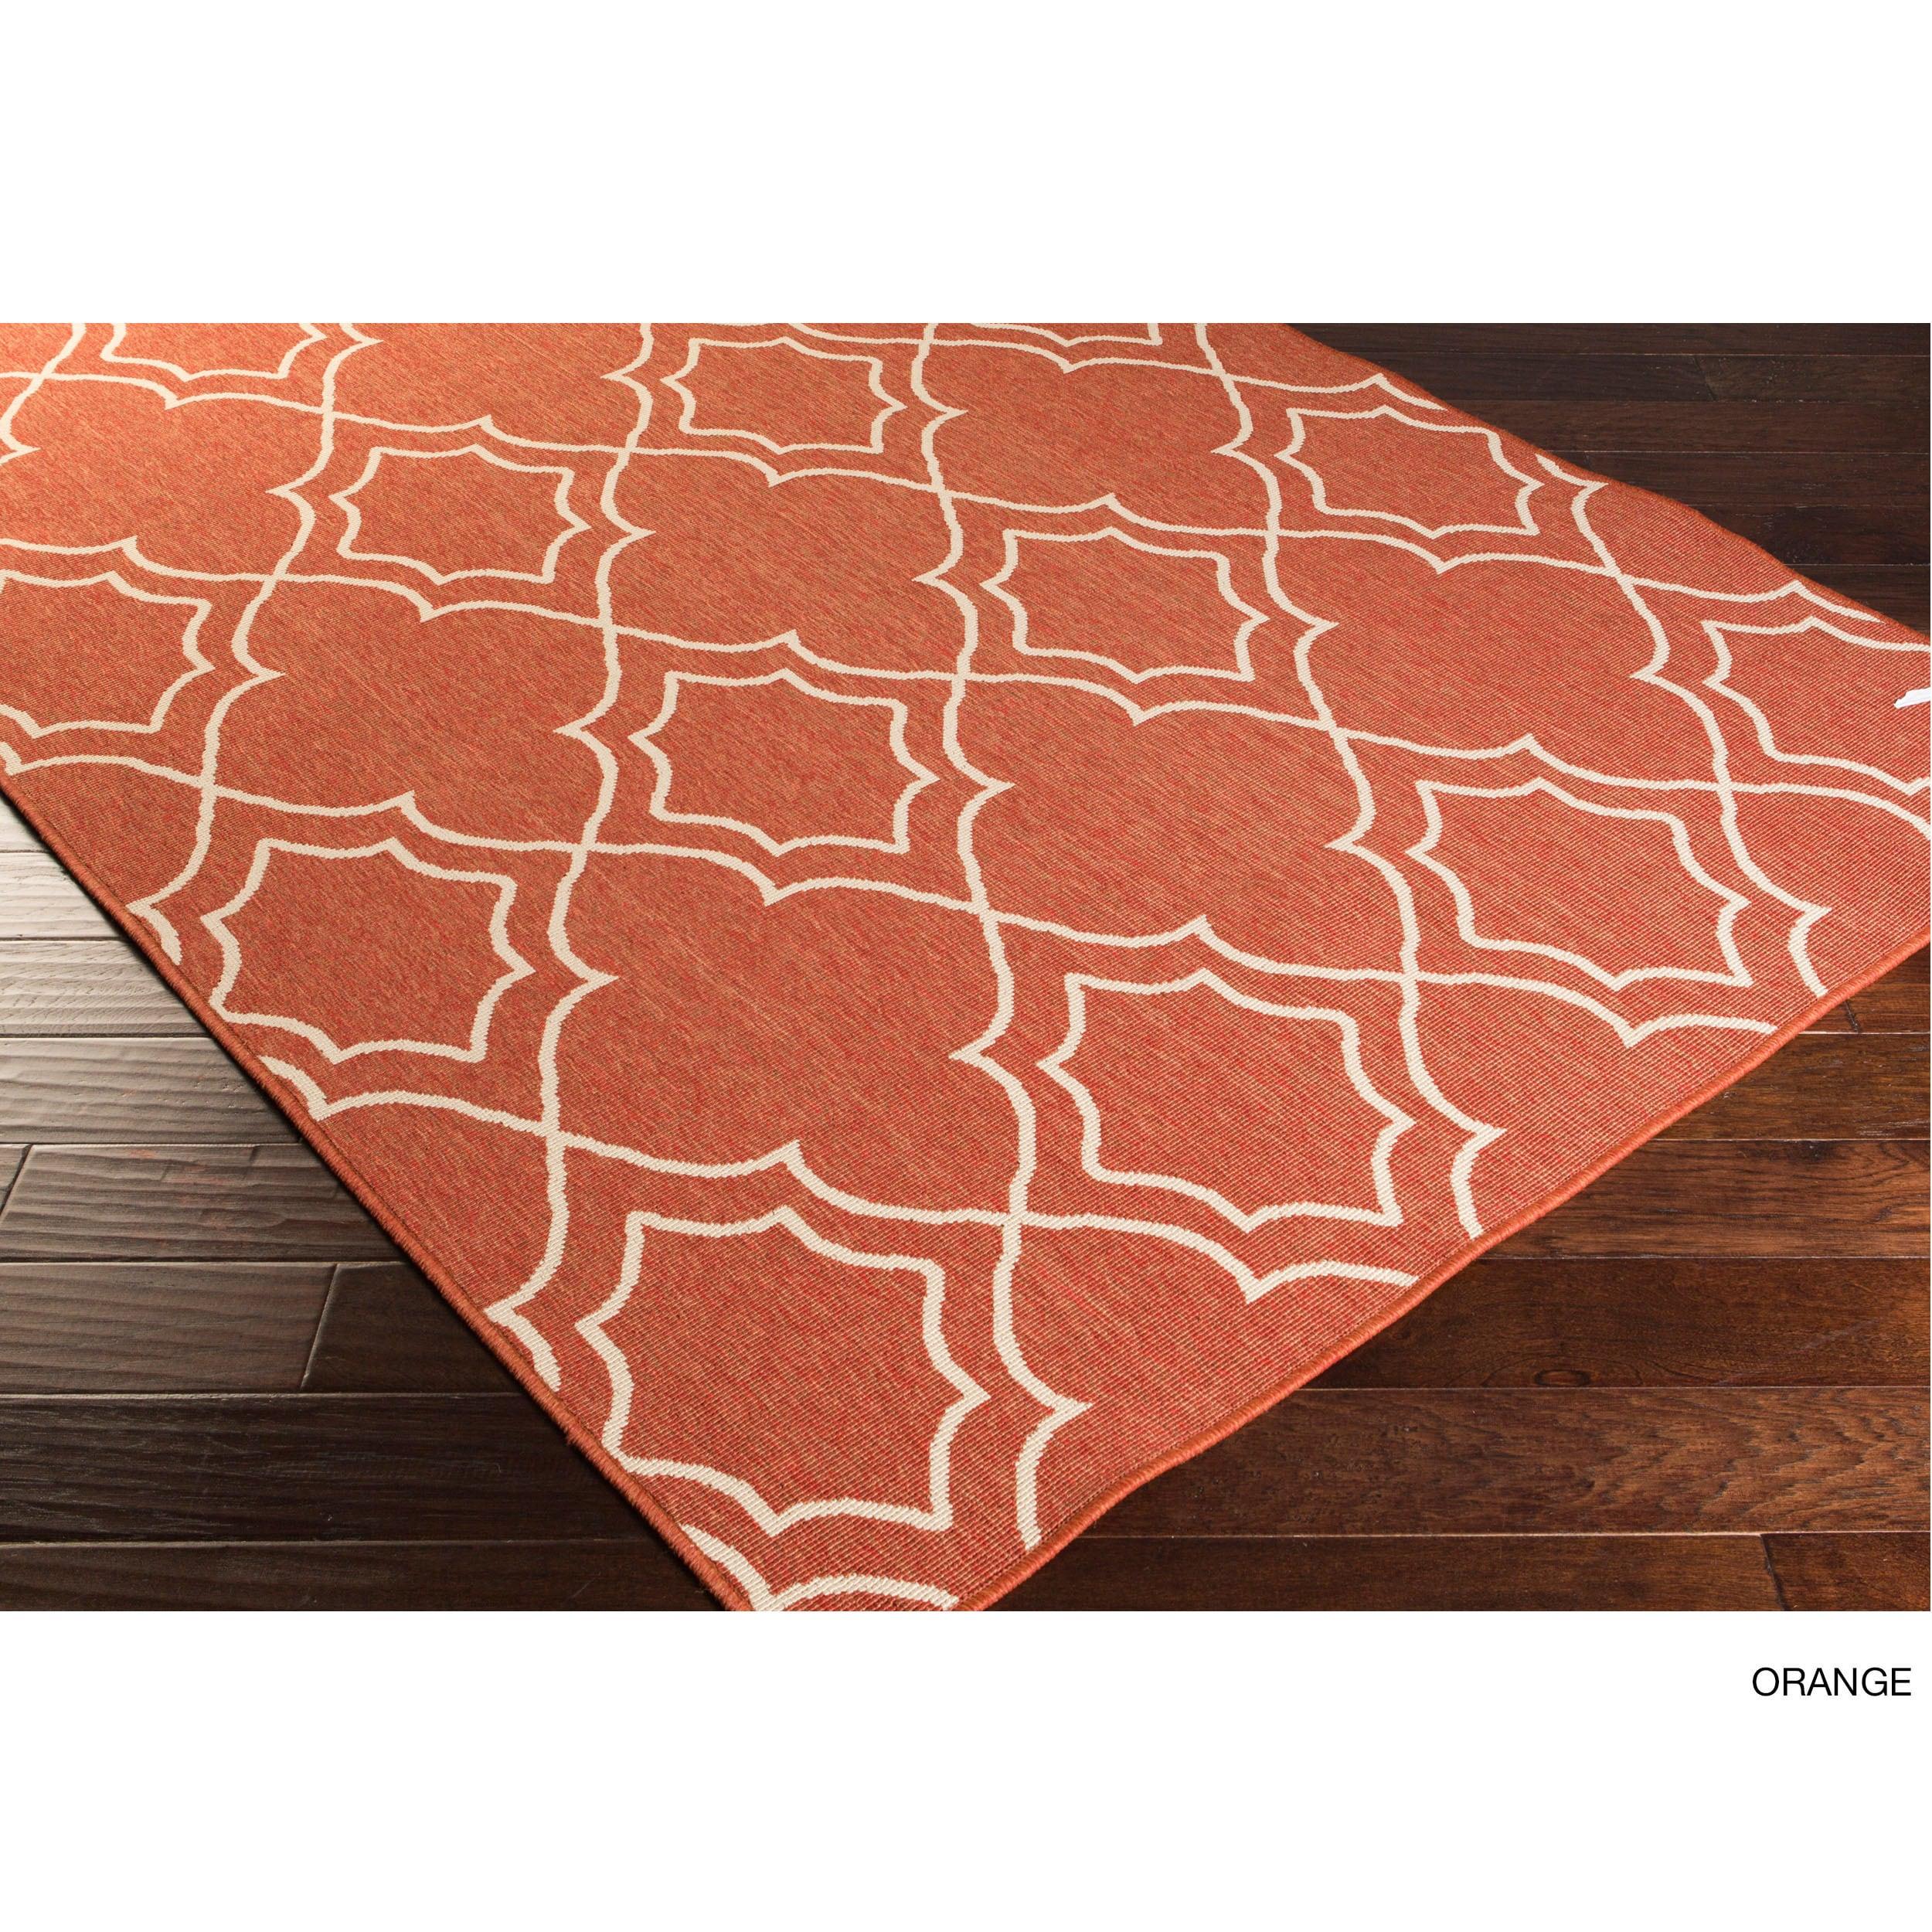 6 X 9 Outdoor Area Rugs | Home design ideas